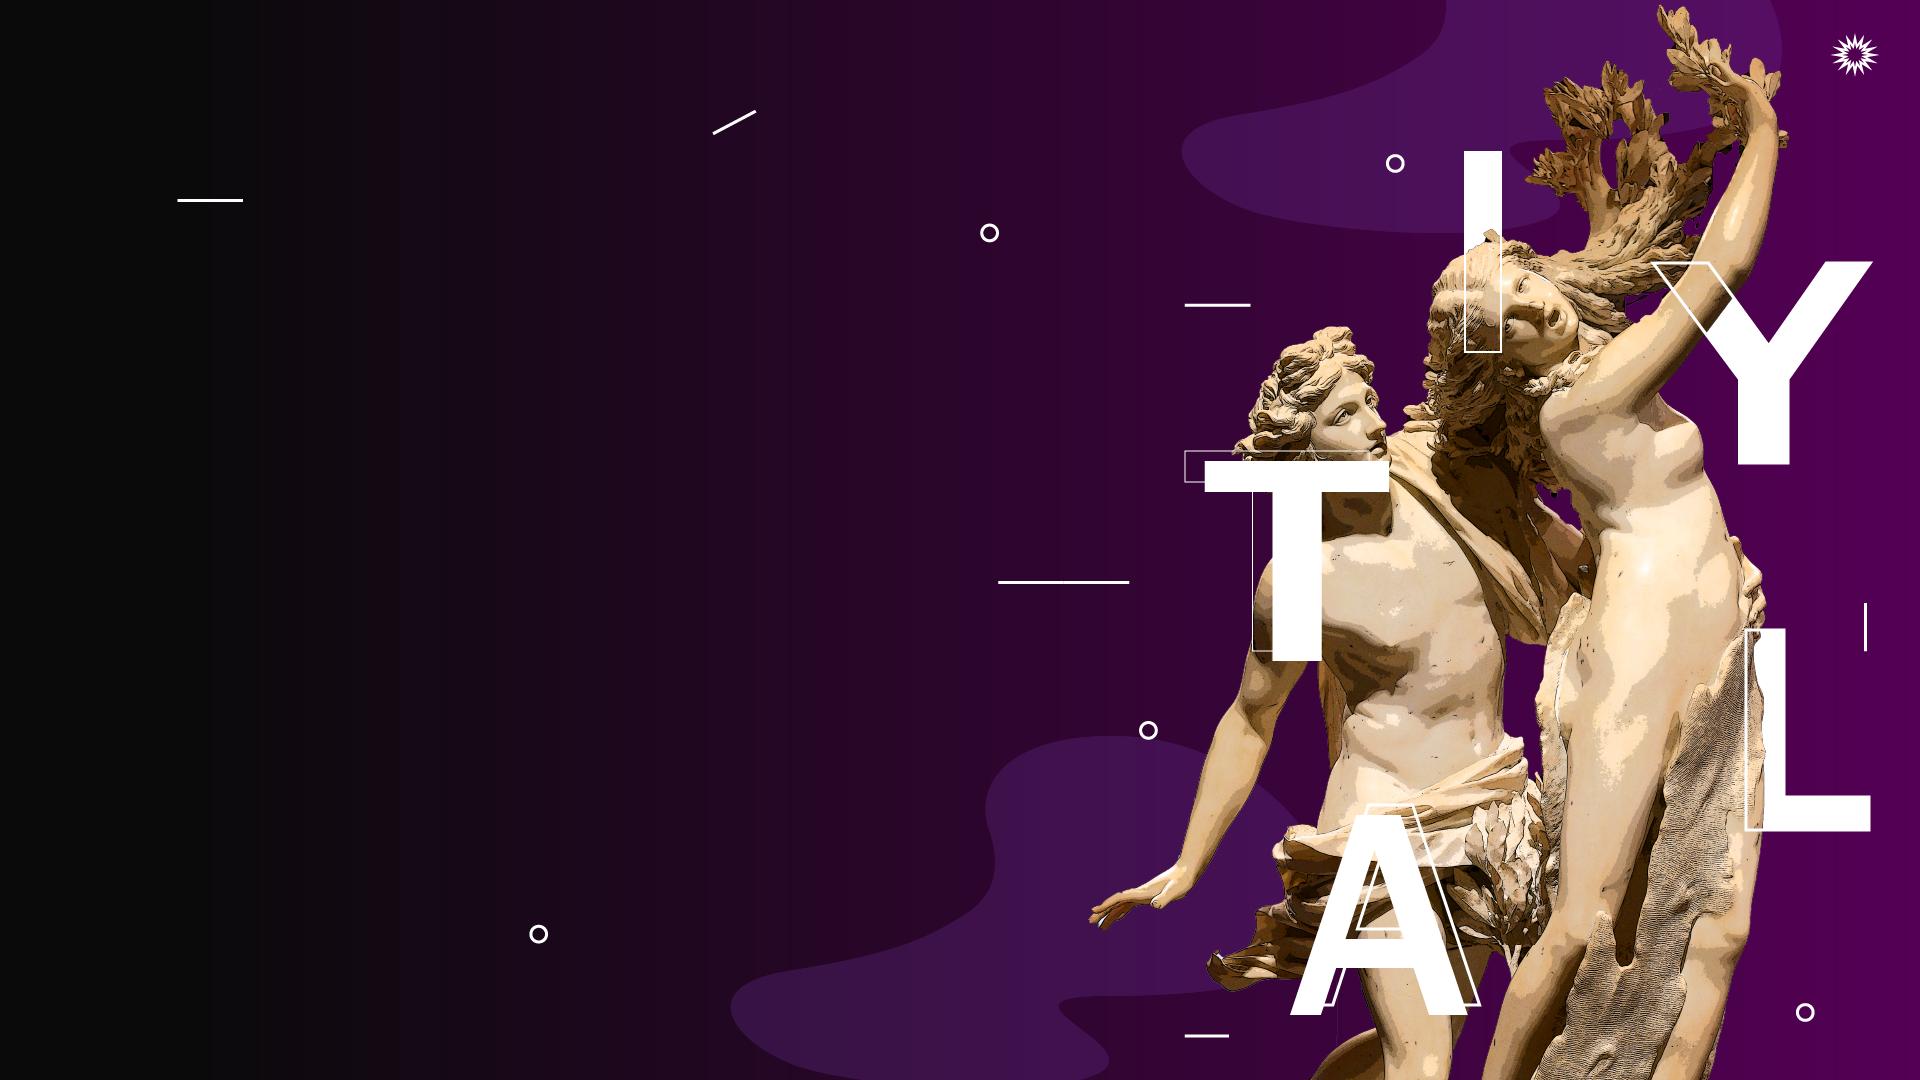 italian-wonders-01-Immagine-principale